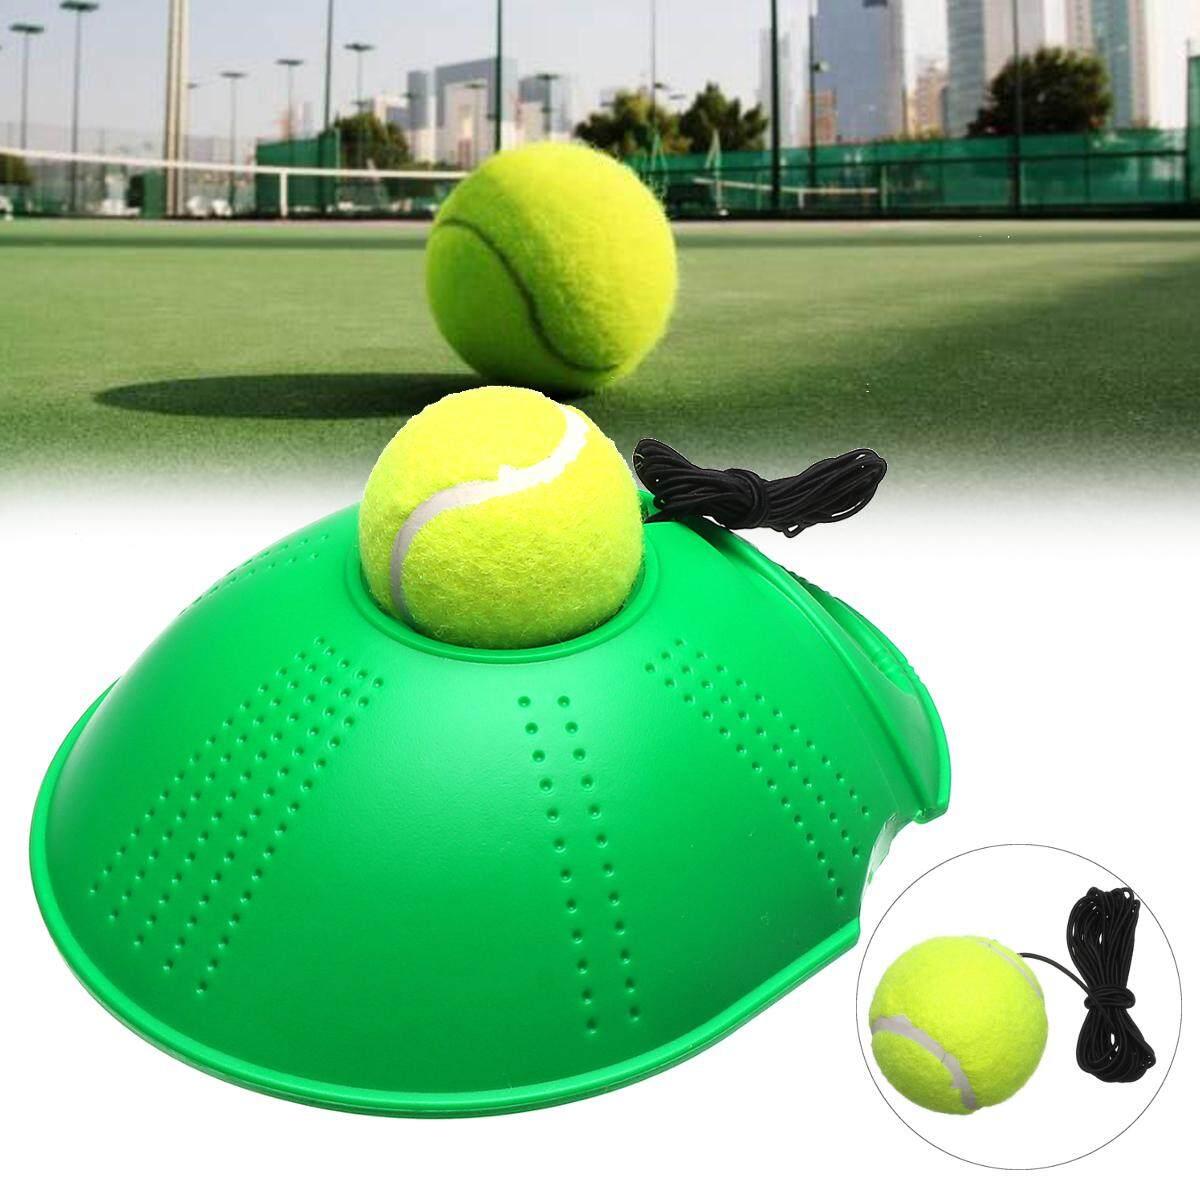 Hình ảnh Single Tennis Rebound Trainer Self-study Training Ball Baseboard Holder Aid